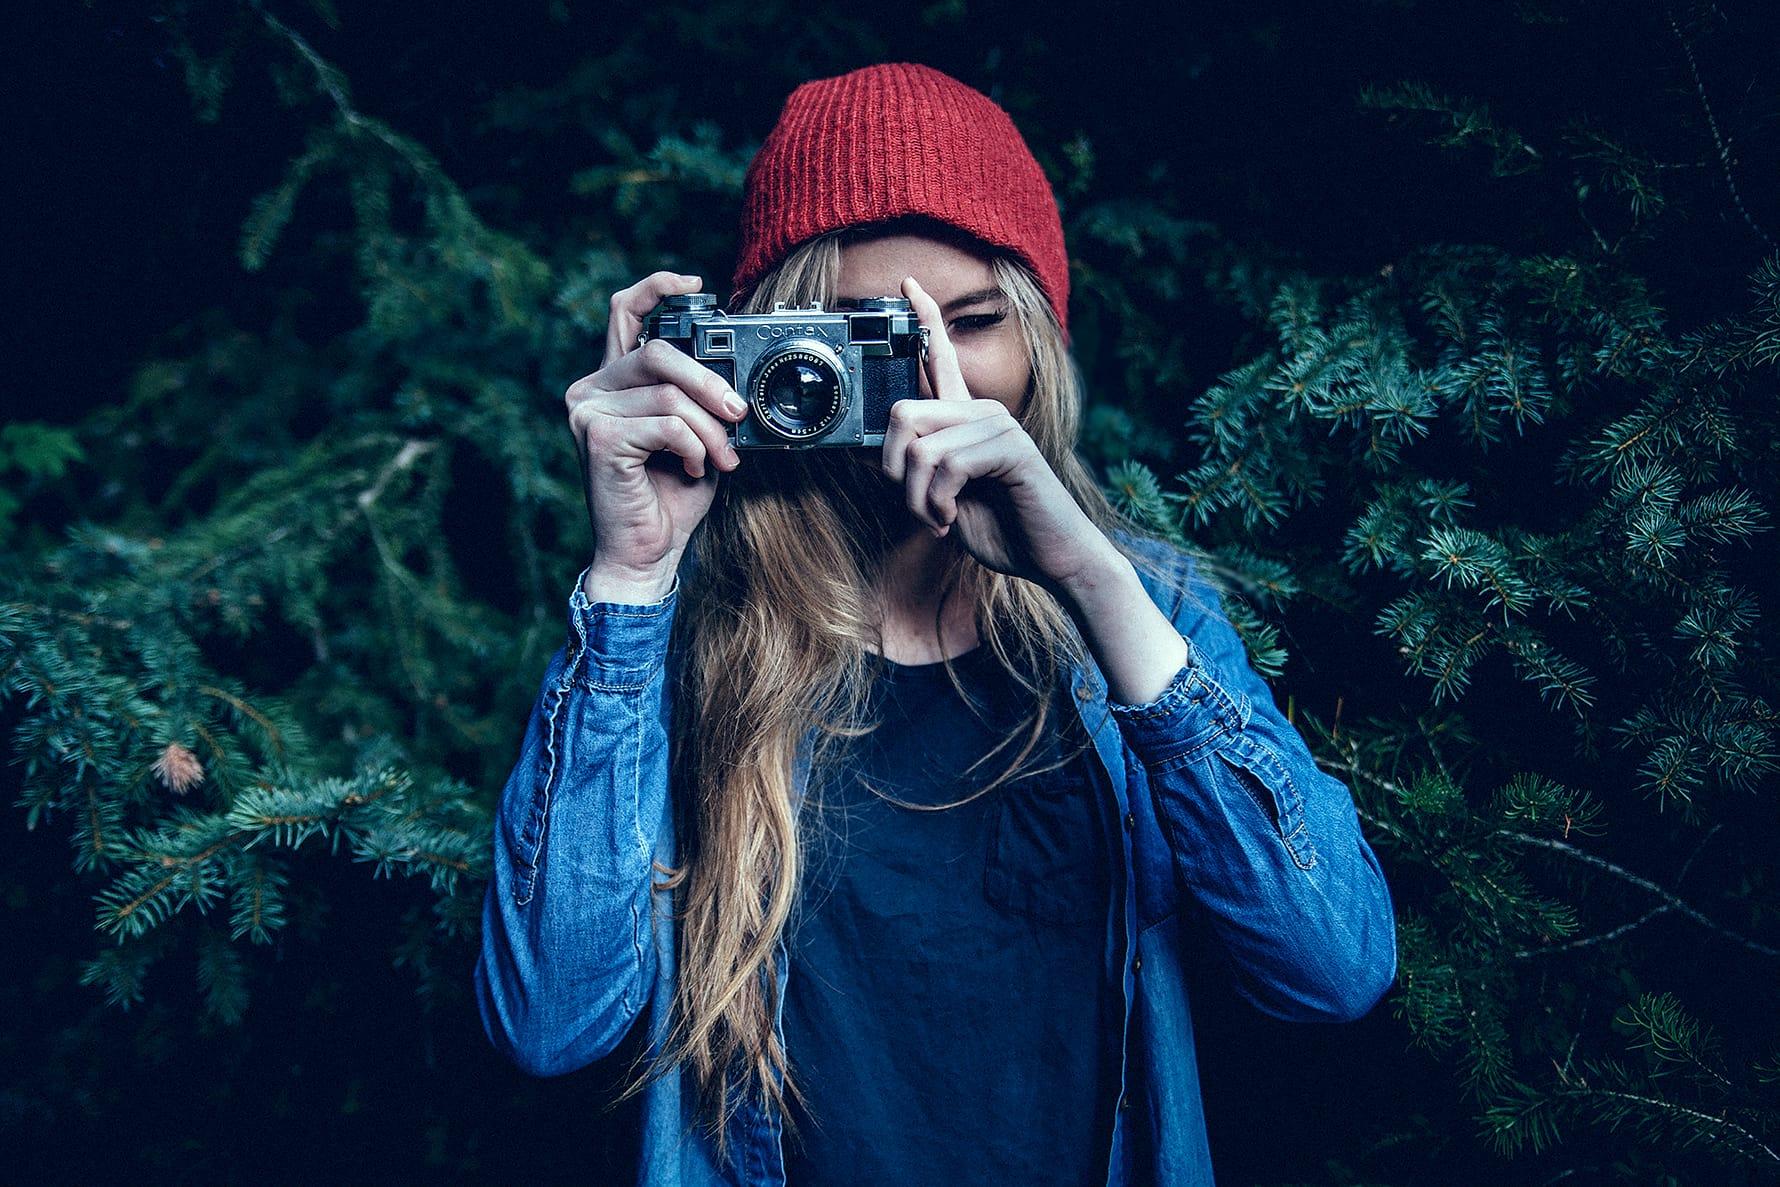 petdeset popularnih fotografij